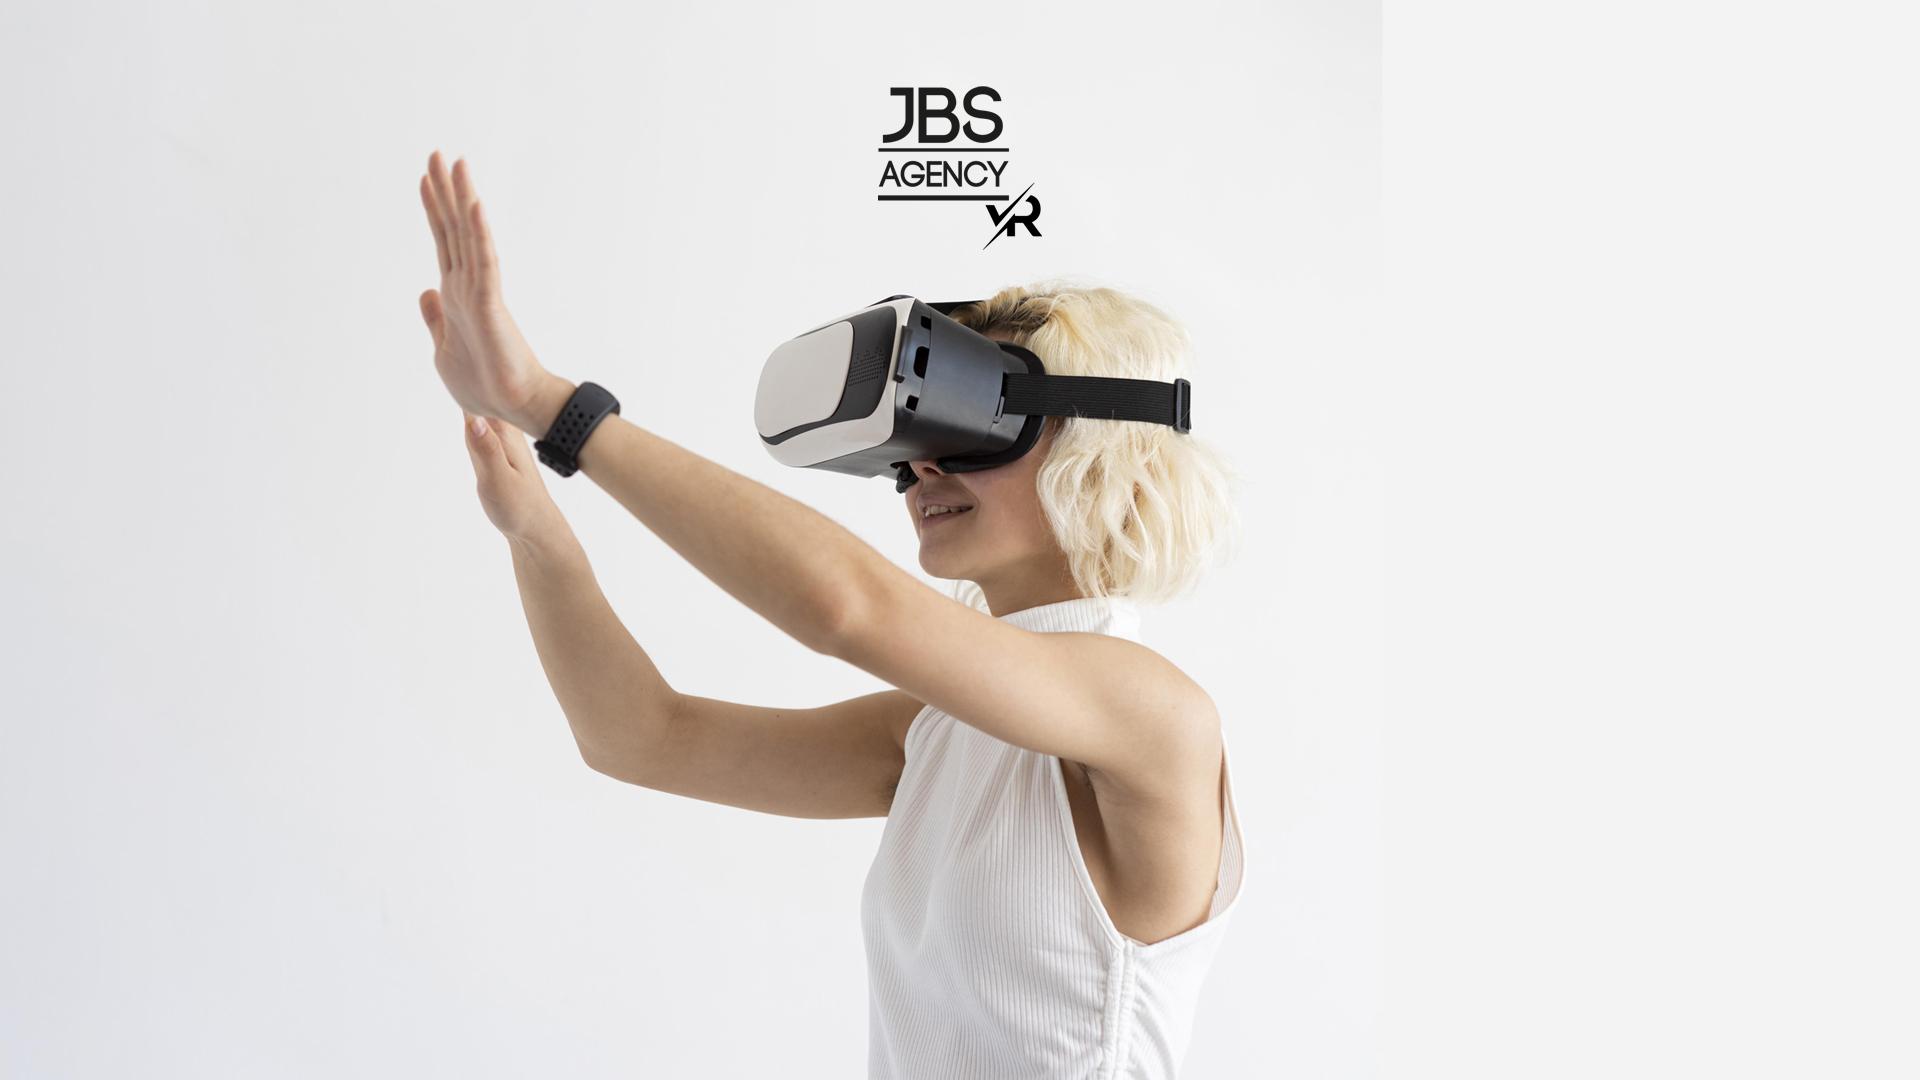 vr-360-business